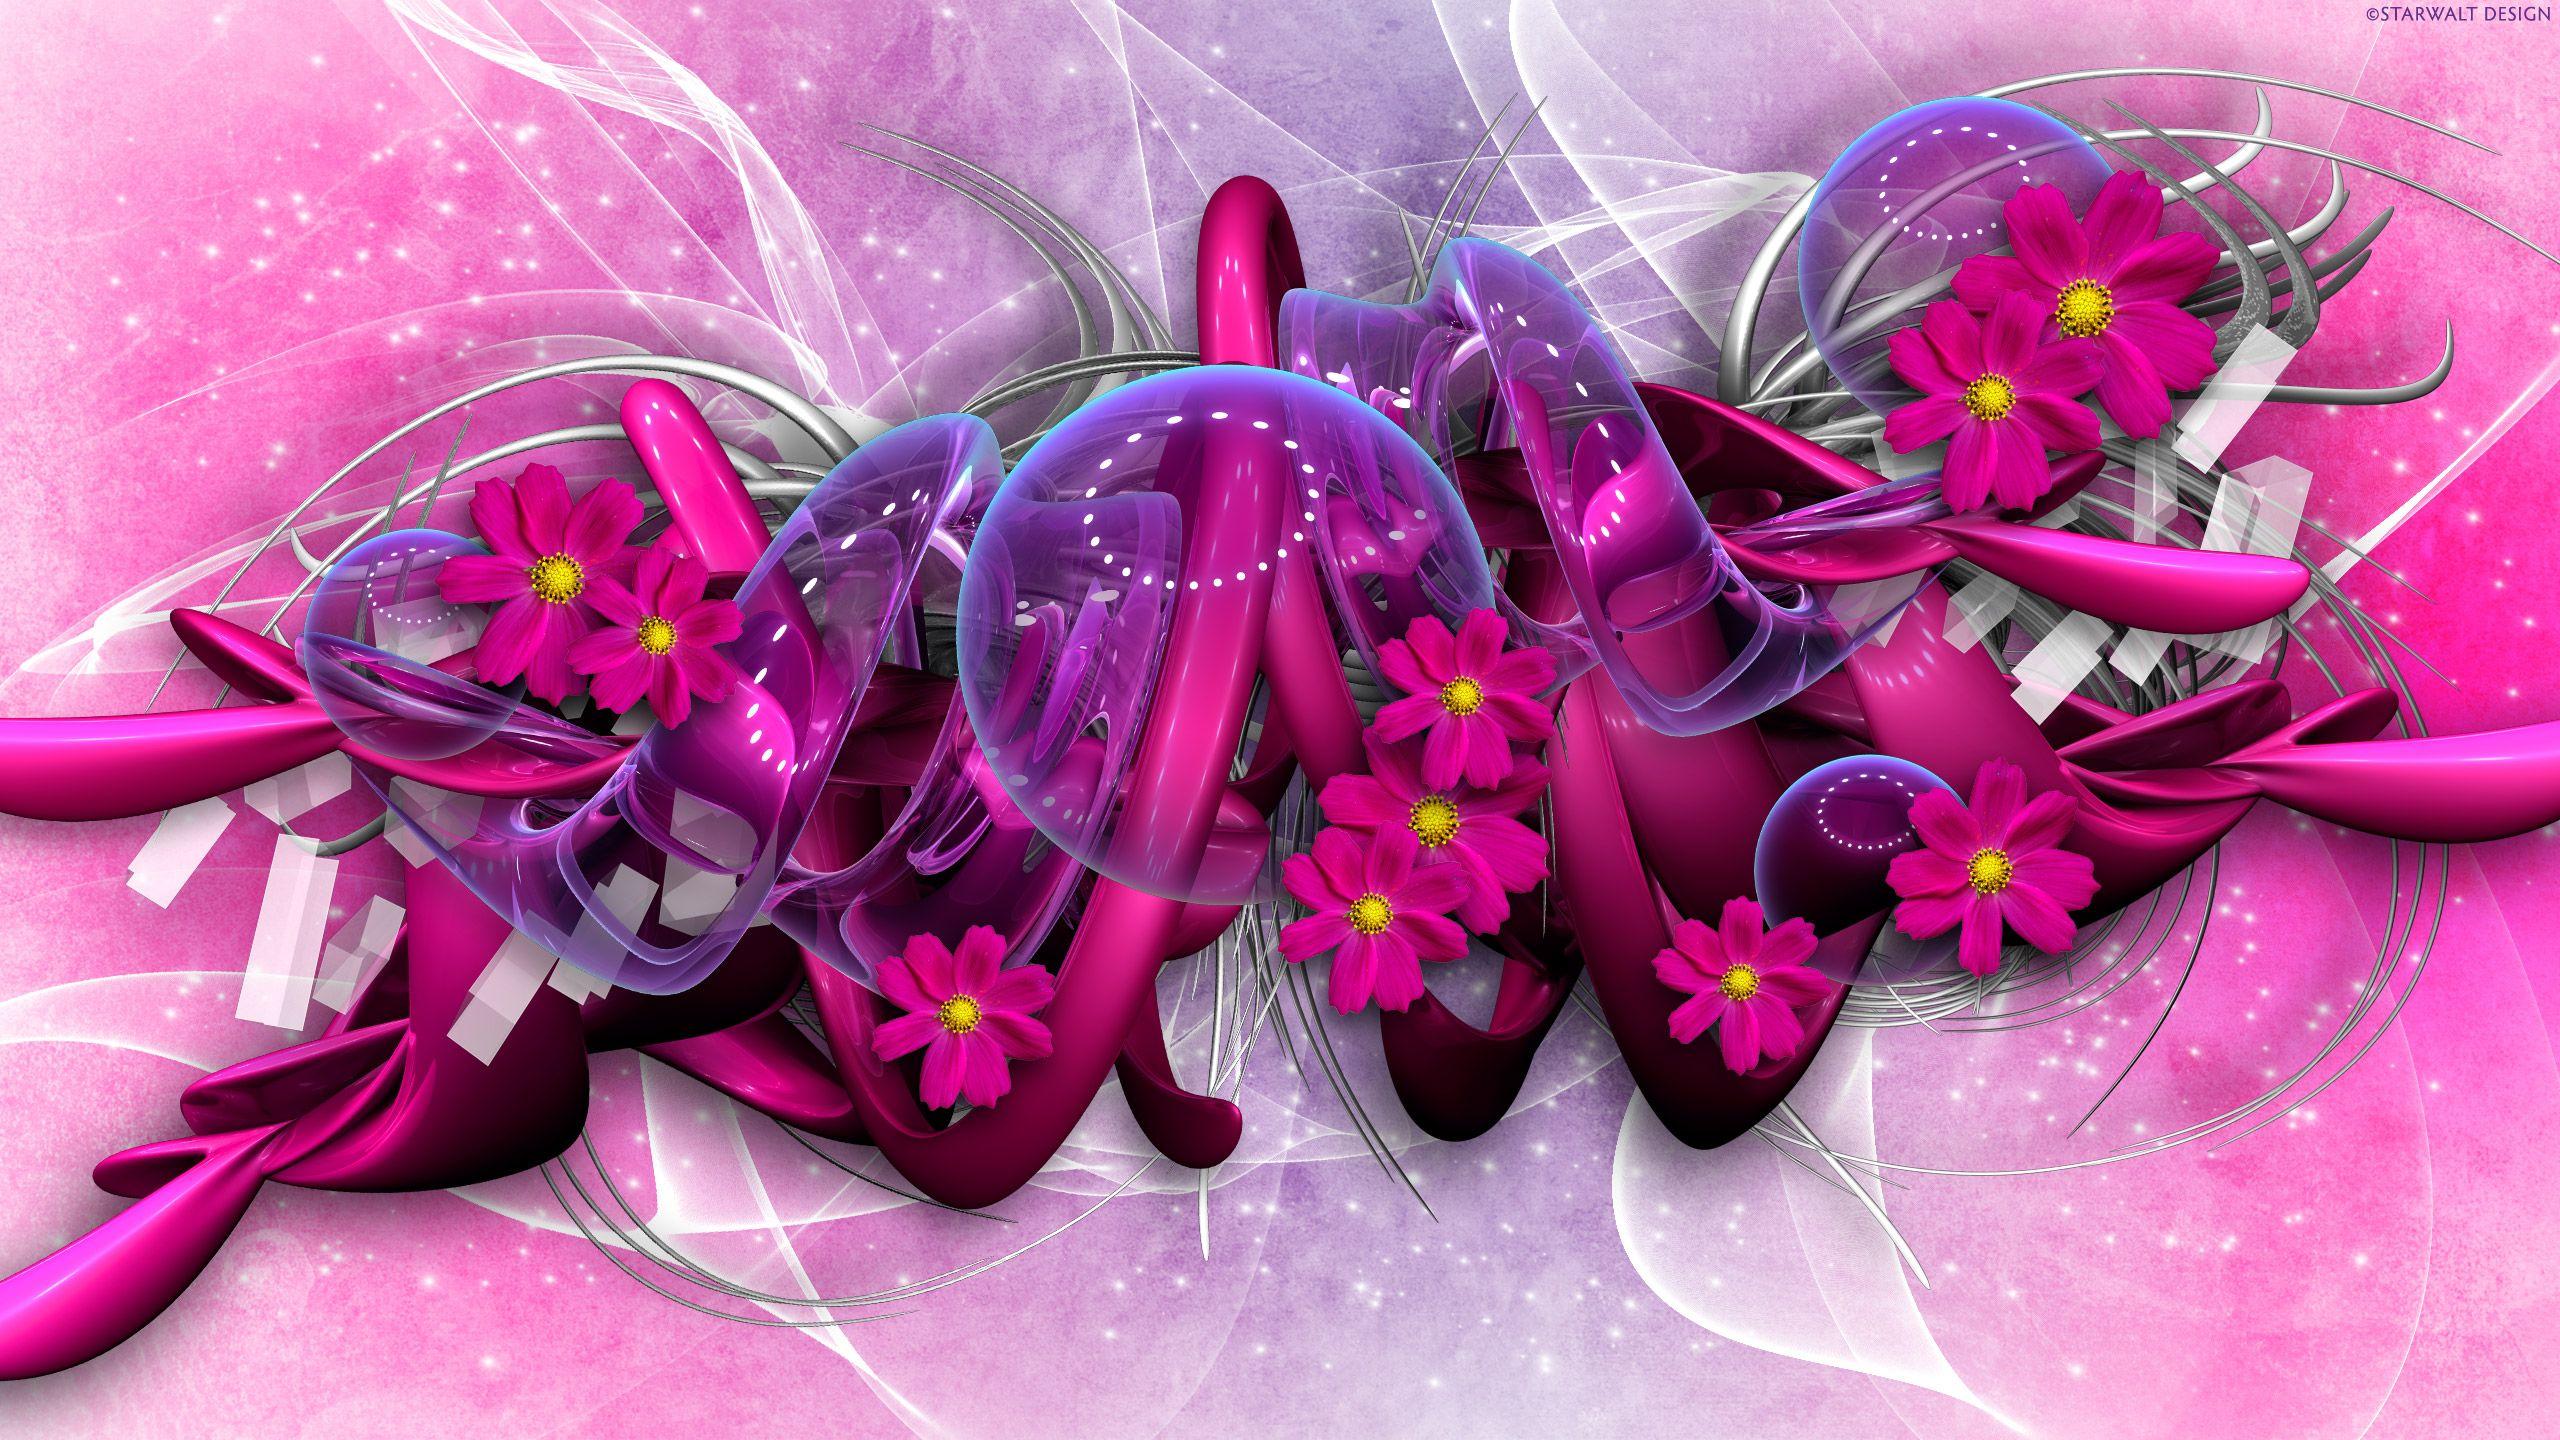 Pink by Gina (StarwaltDesign) http://www.starwalt.com/HD_7.html